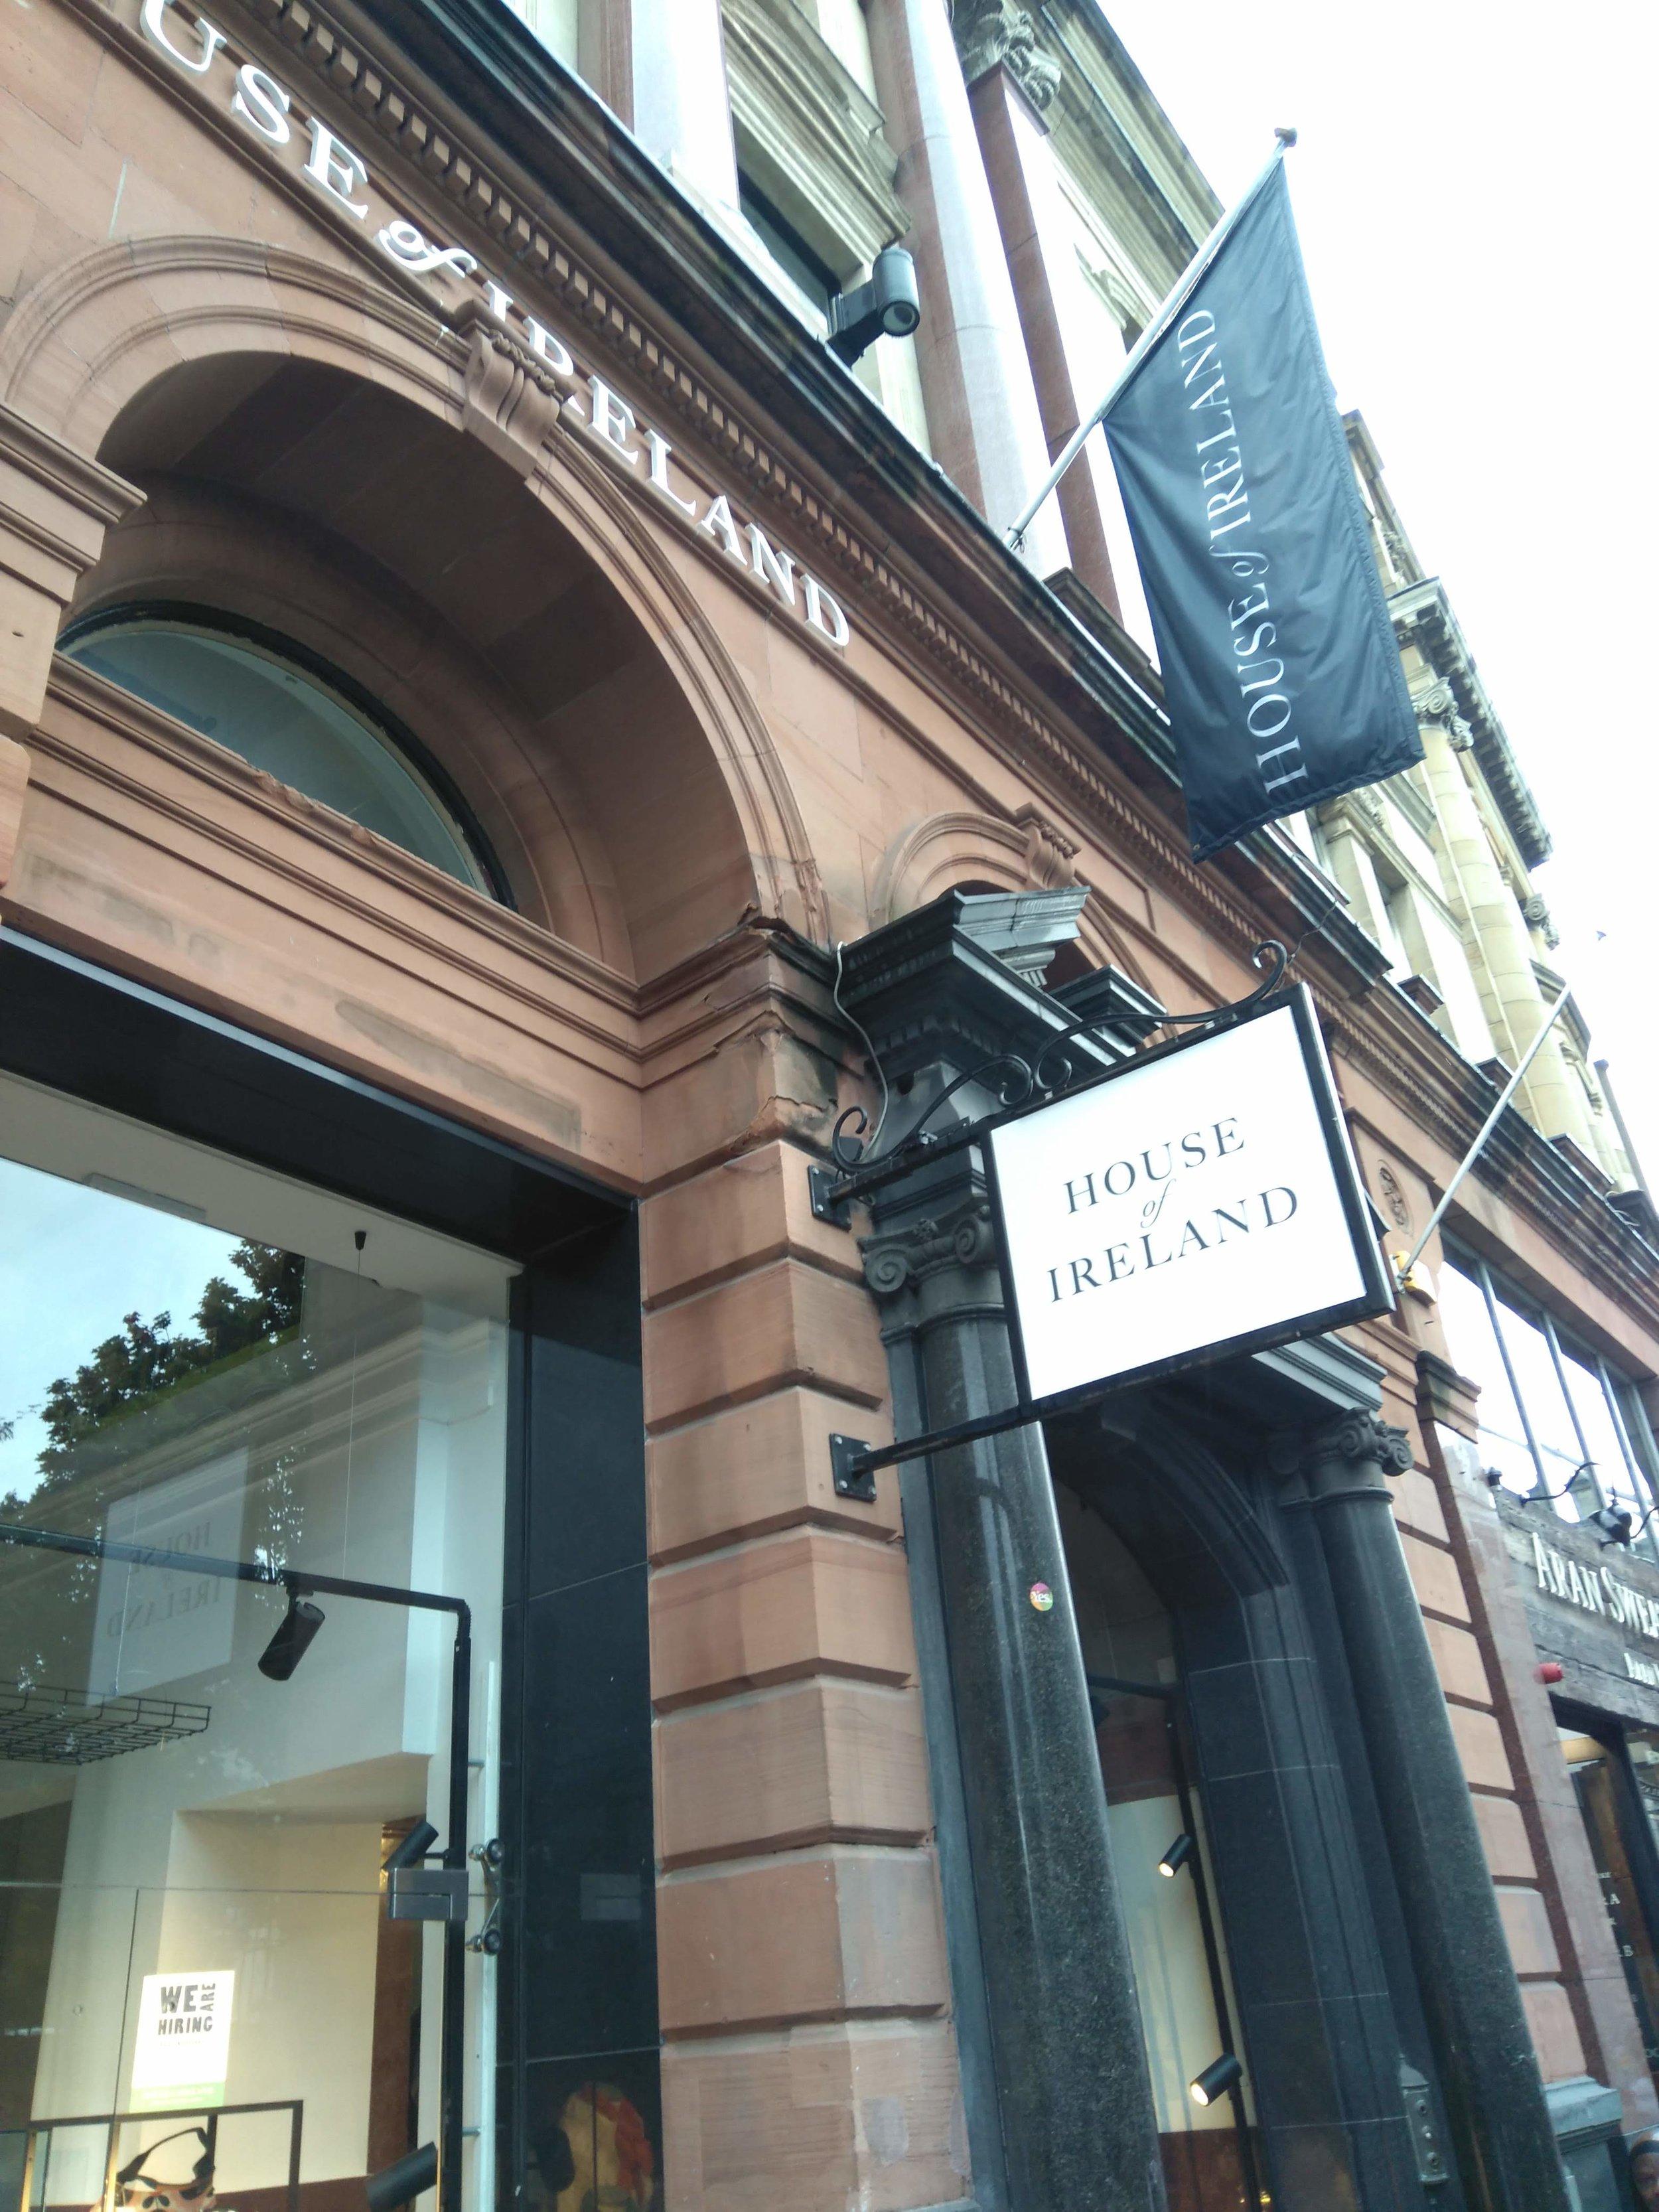 House of Ireland, 114 Grafton Street,Dublin